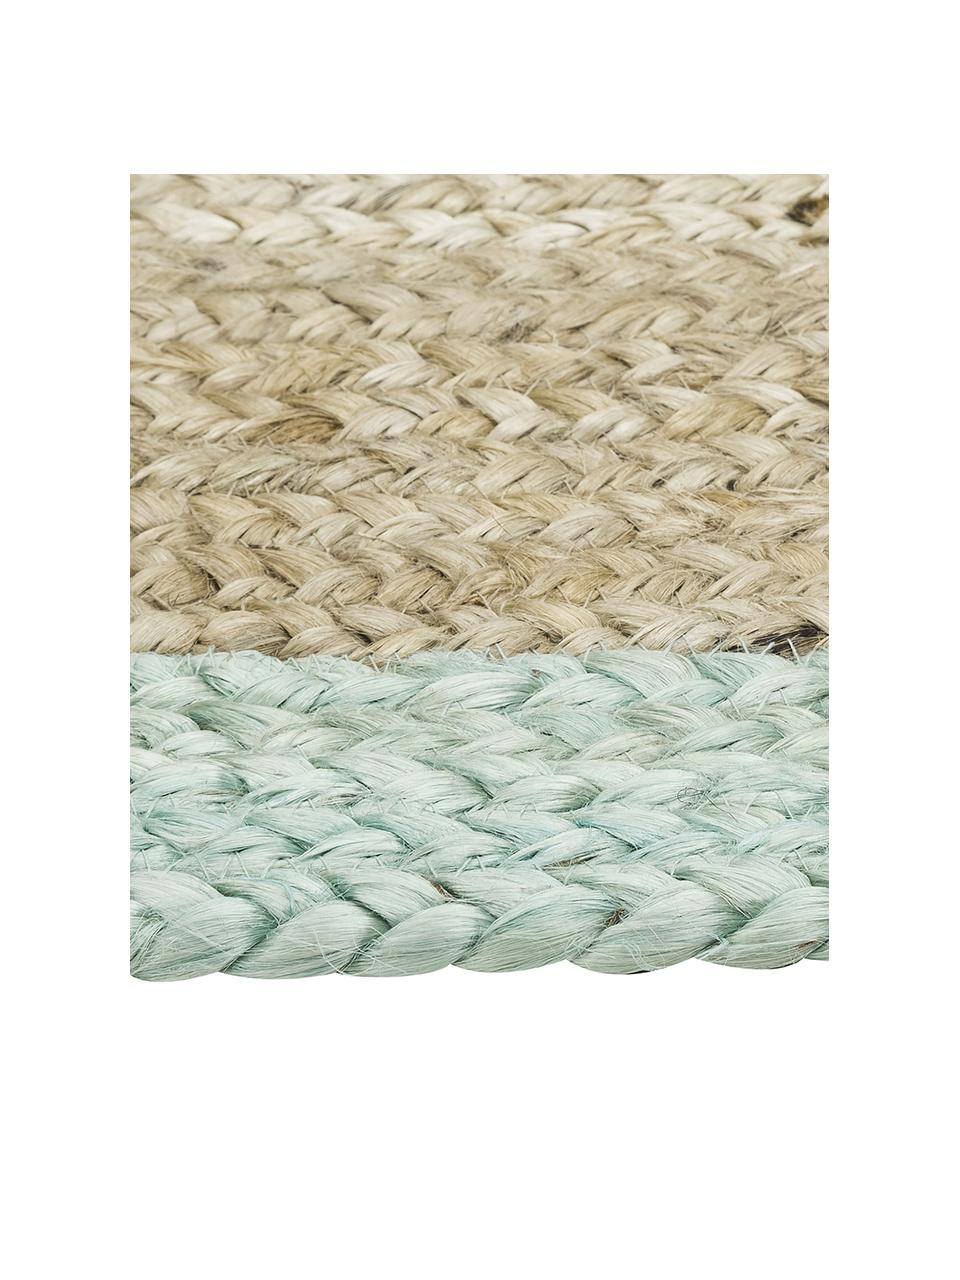 Handgemaakt juten vloerkleed Shanta met muntgroene rand, 100% jute, Jute, mintgroen, 160 x 230 cm